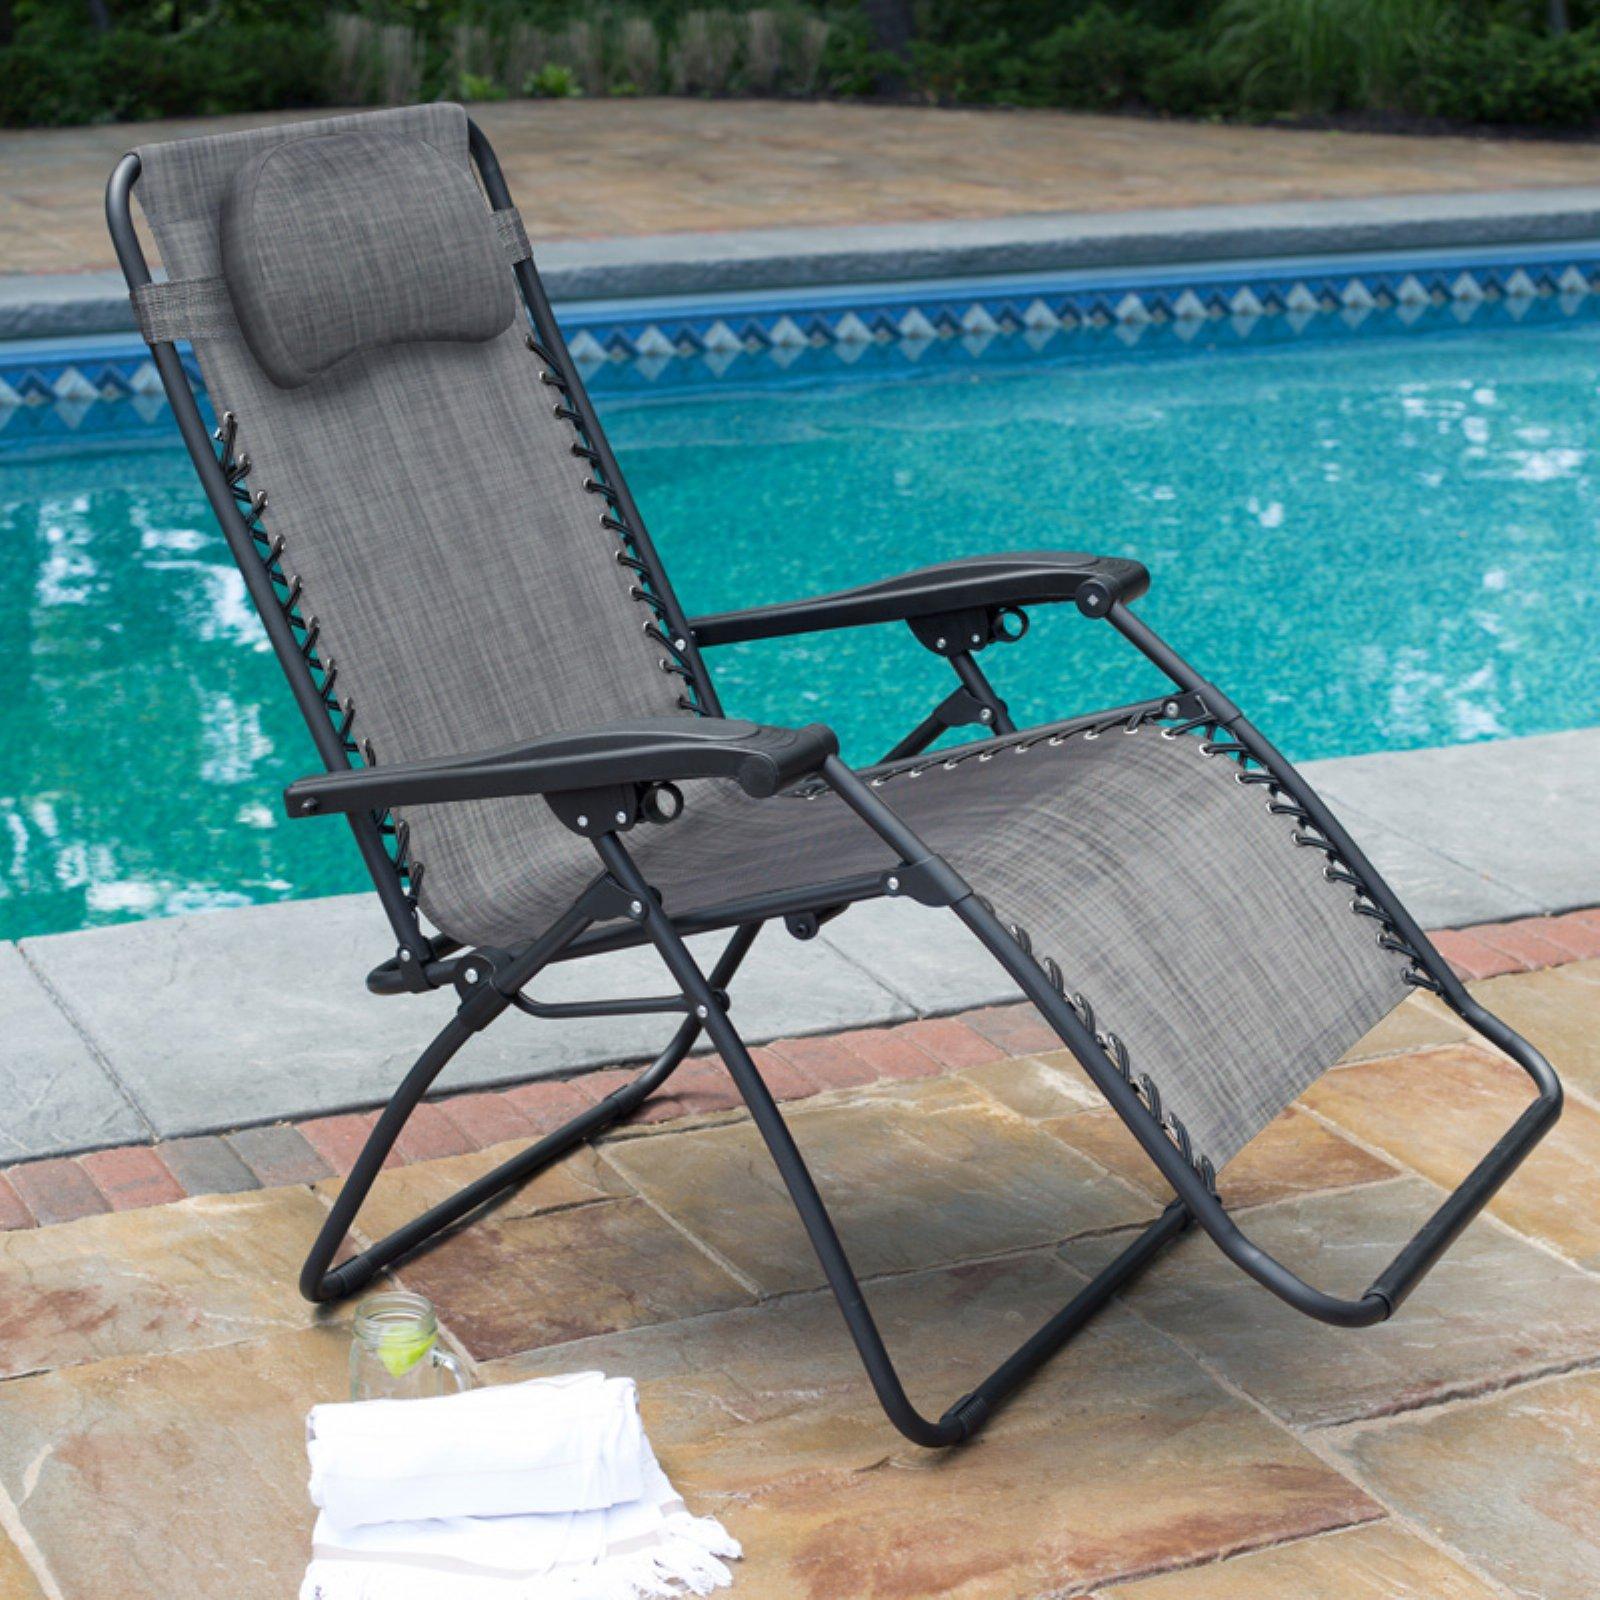 Caravan Global Sports Oversized Zero Gravity Chair